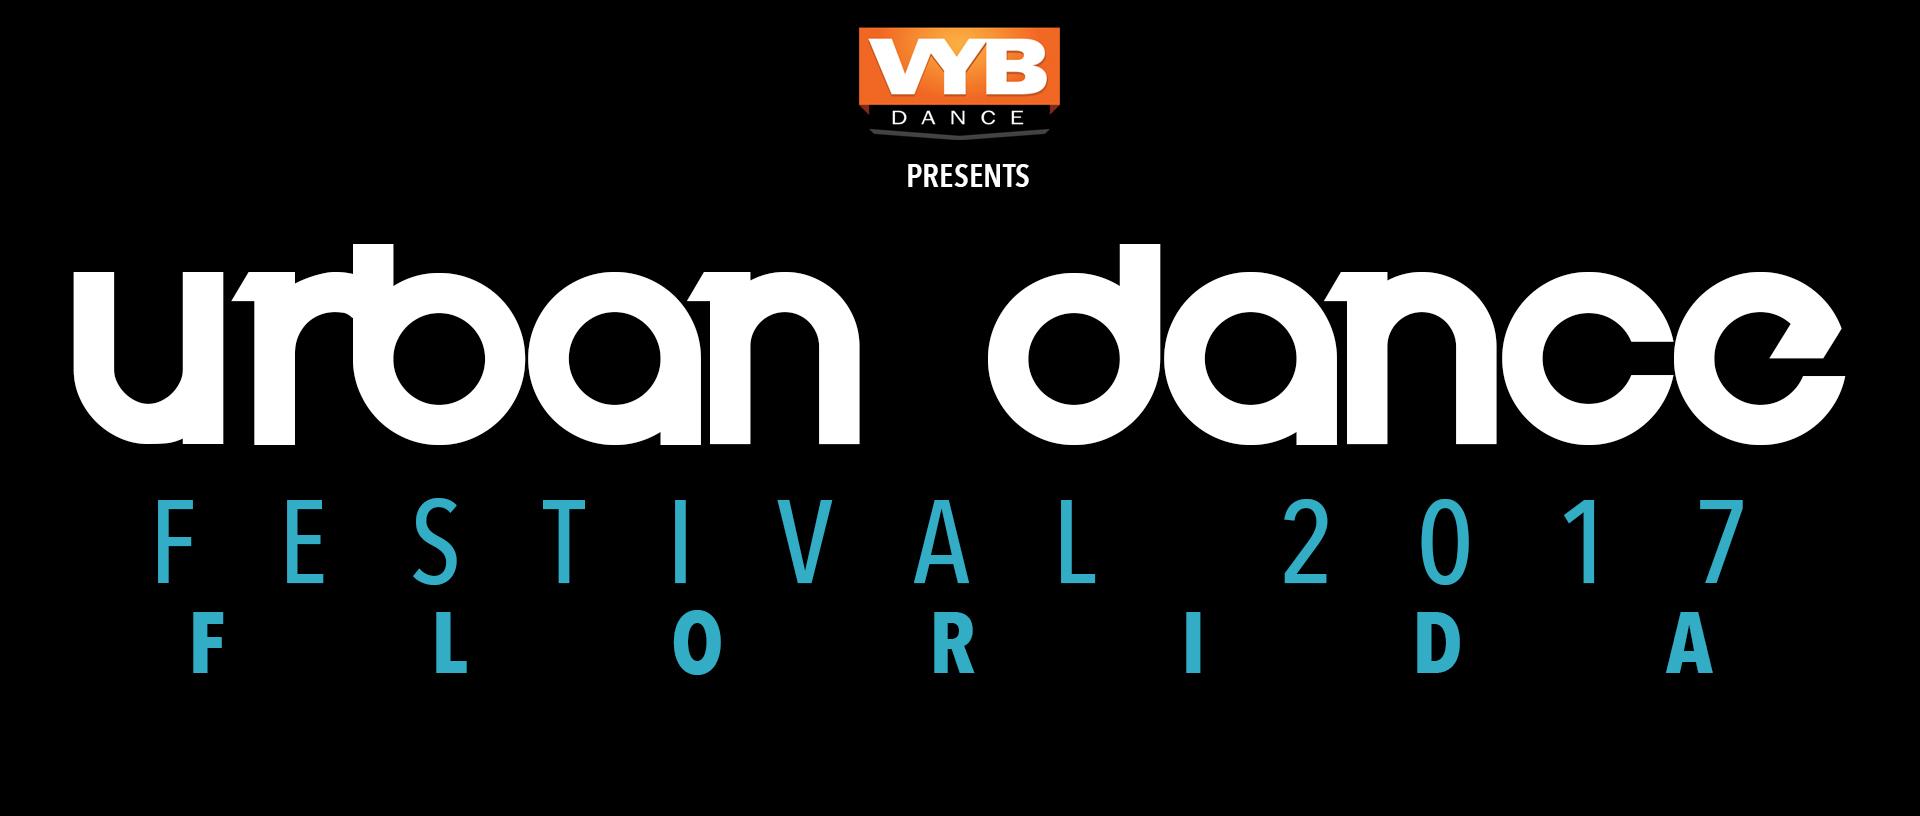 UDF – URBAN DANCE FESTIVAL FLORIDA 2017